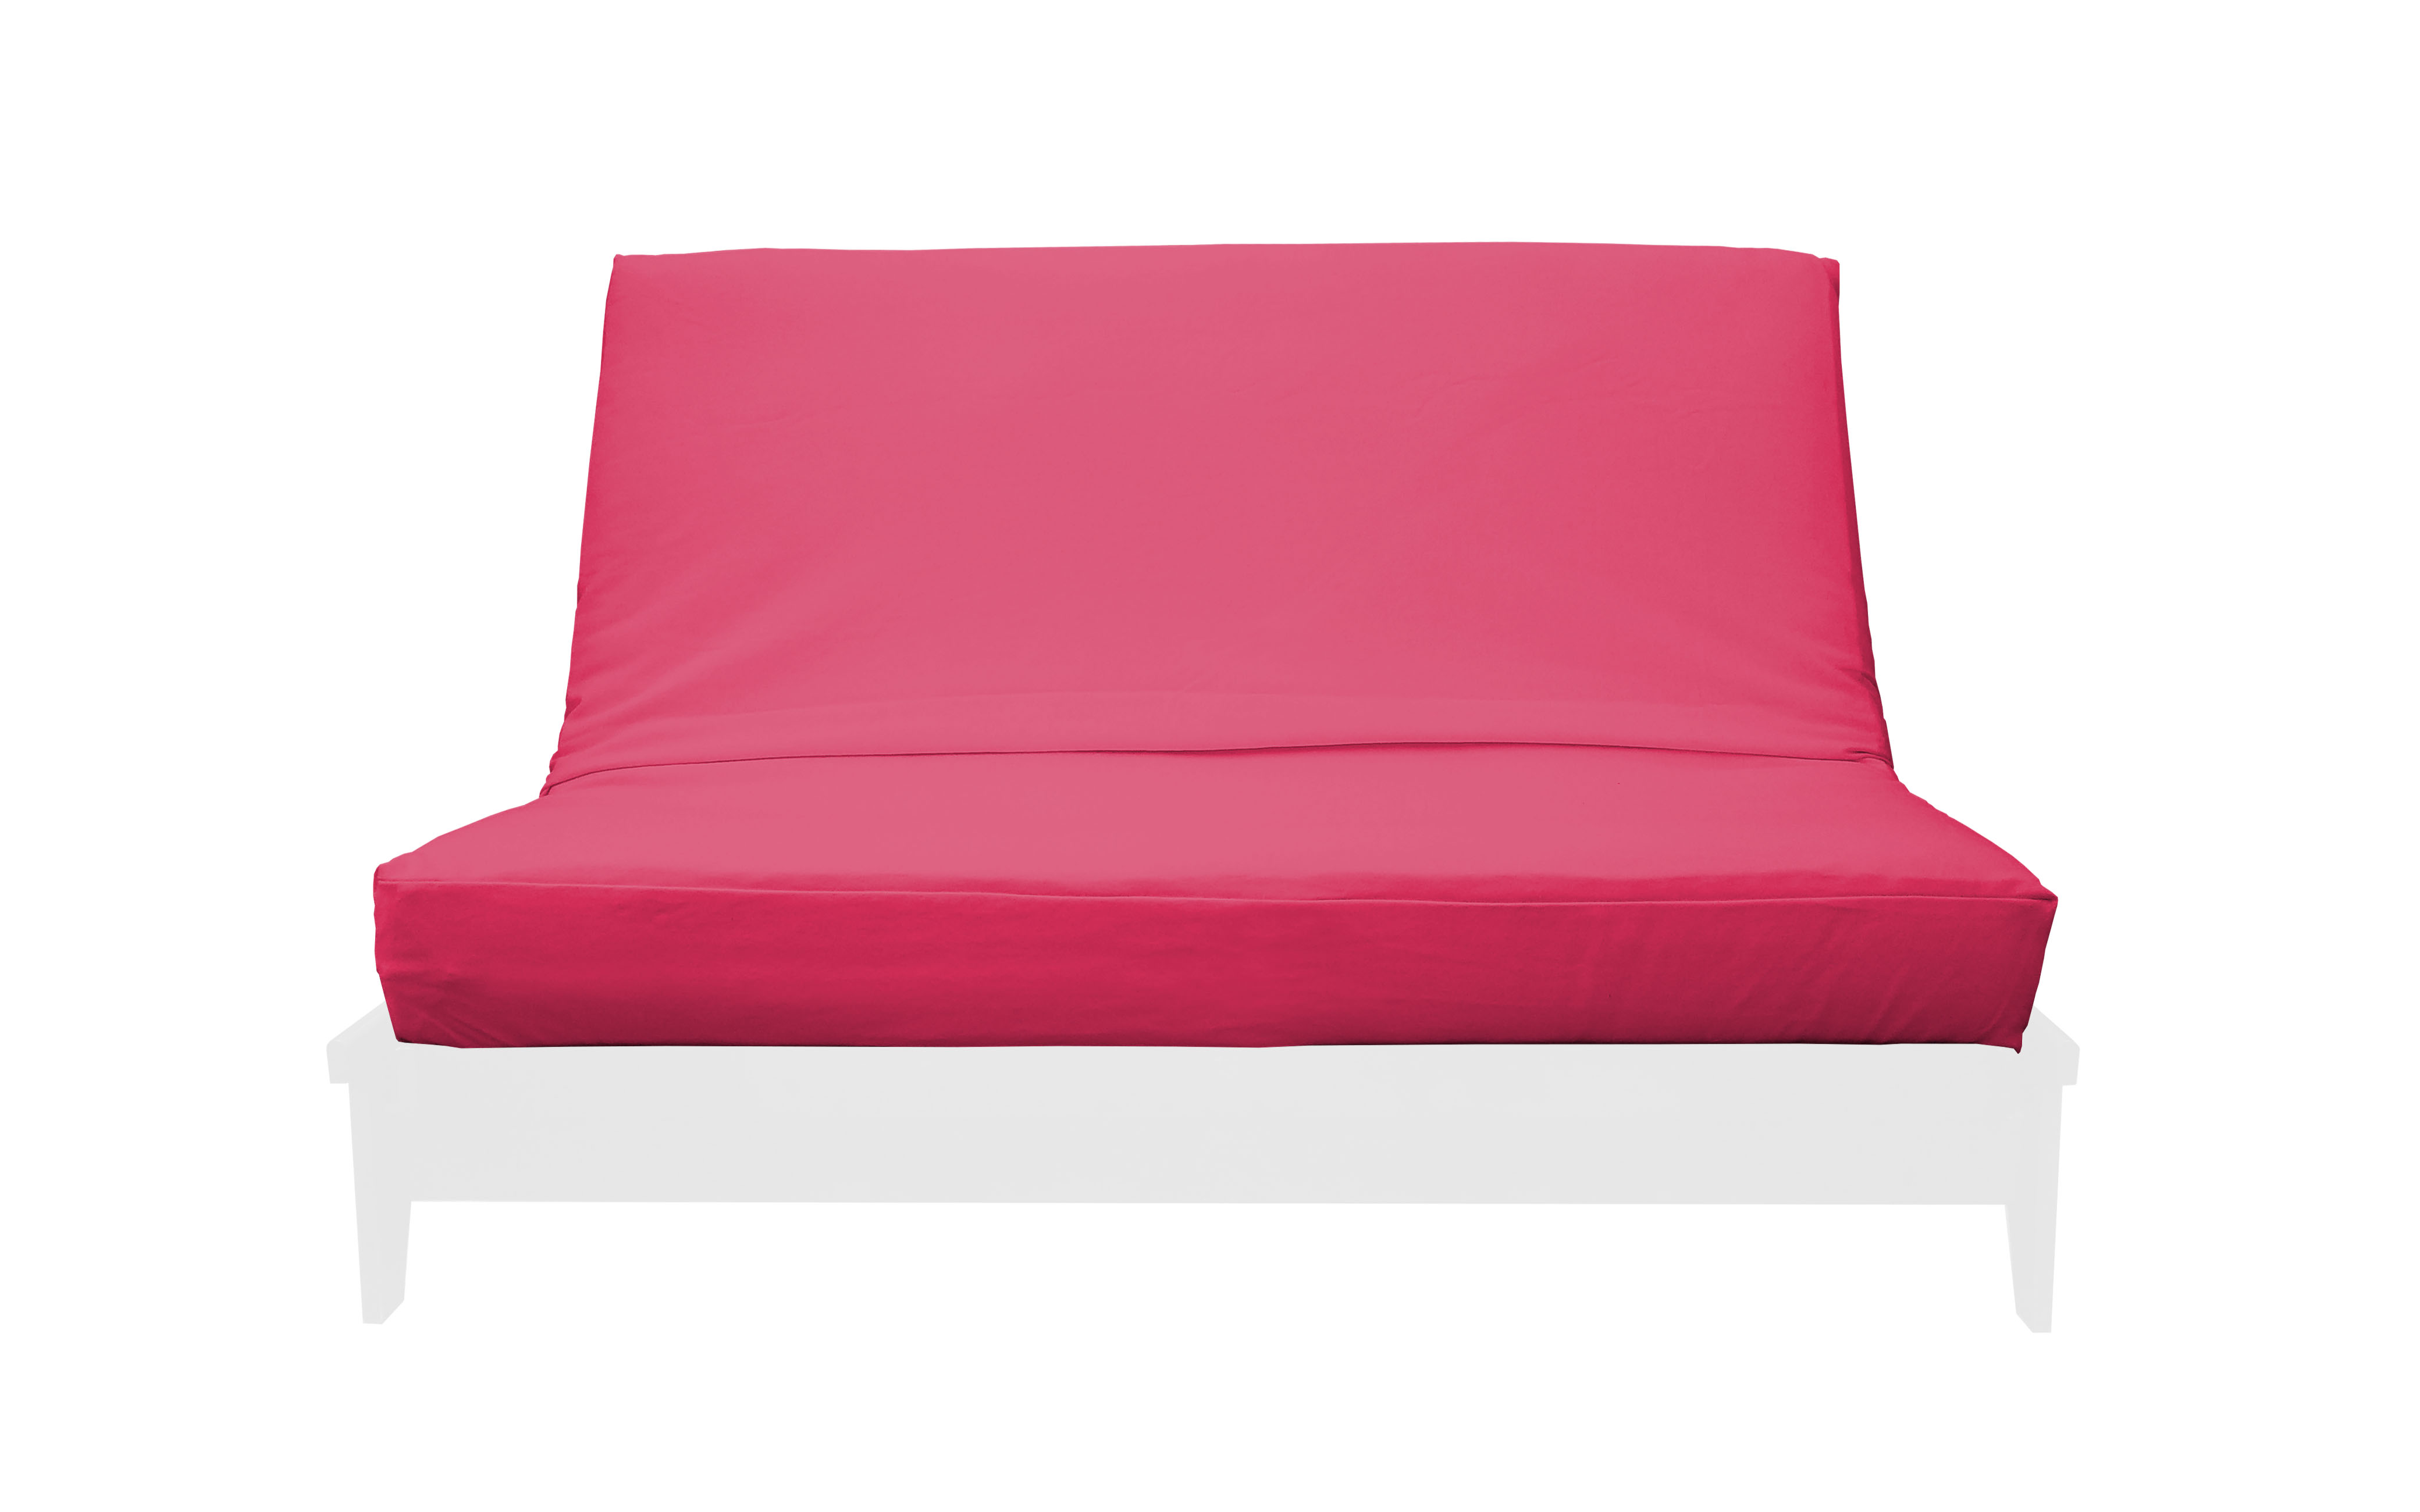 Premium Solid Pink Futon Cover By Prestige